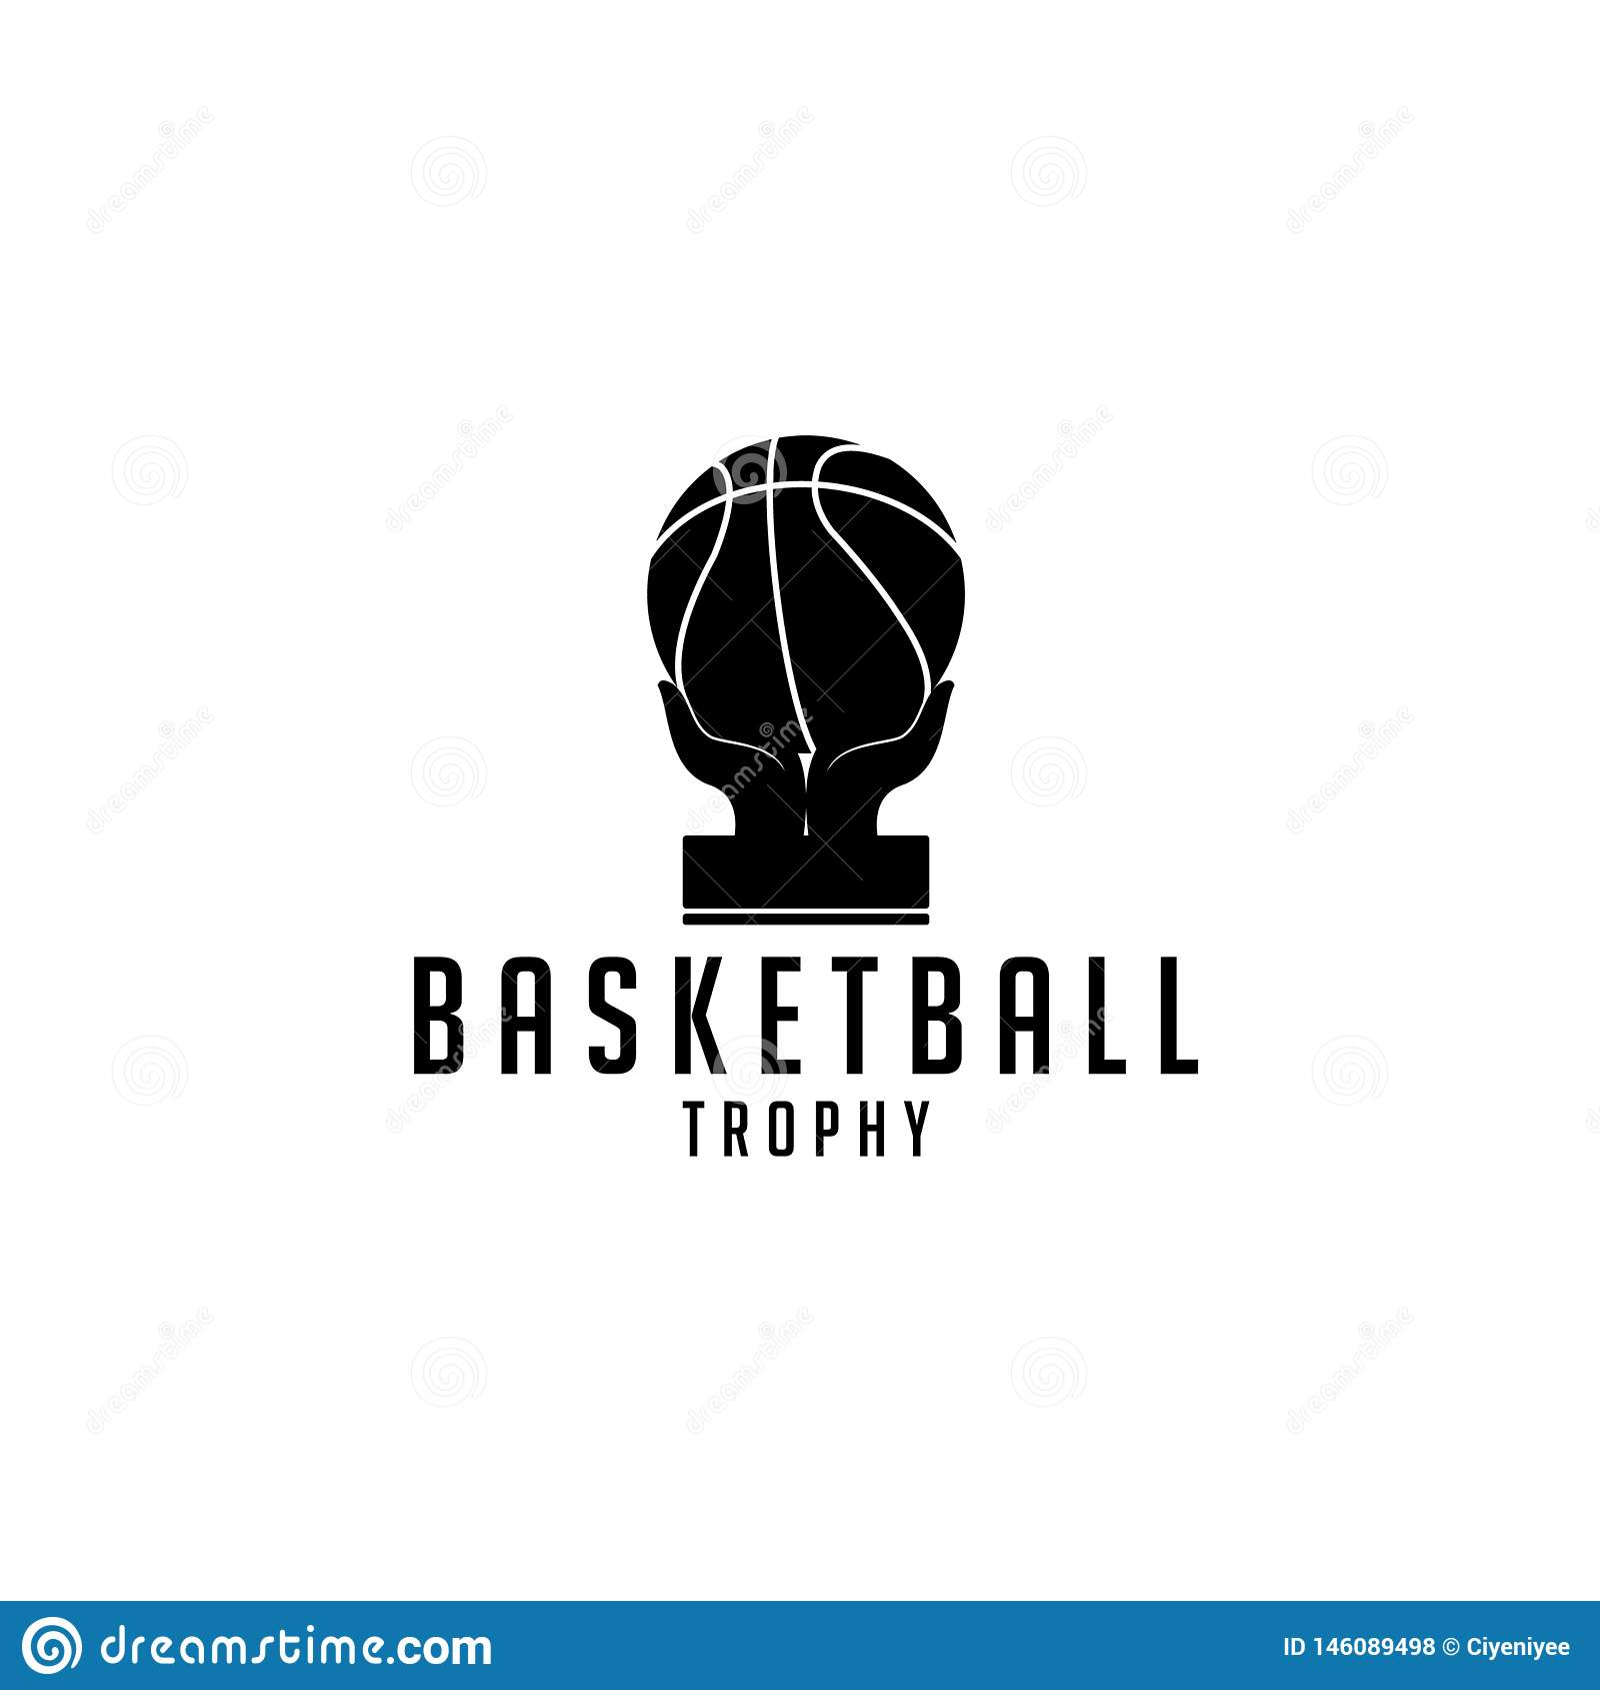 Basketbaltrofee